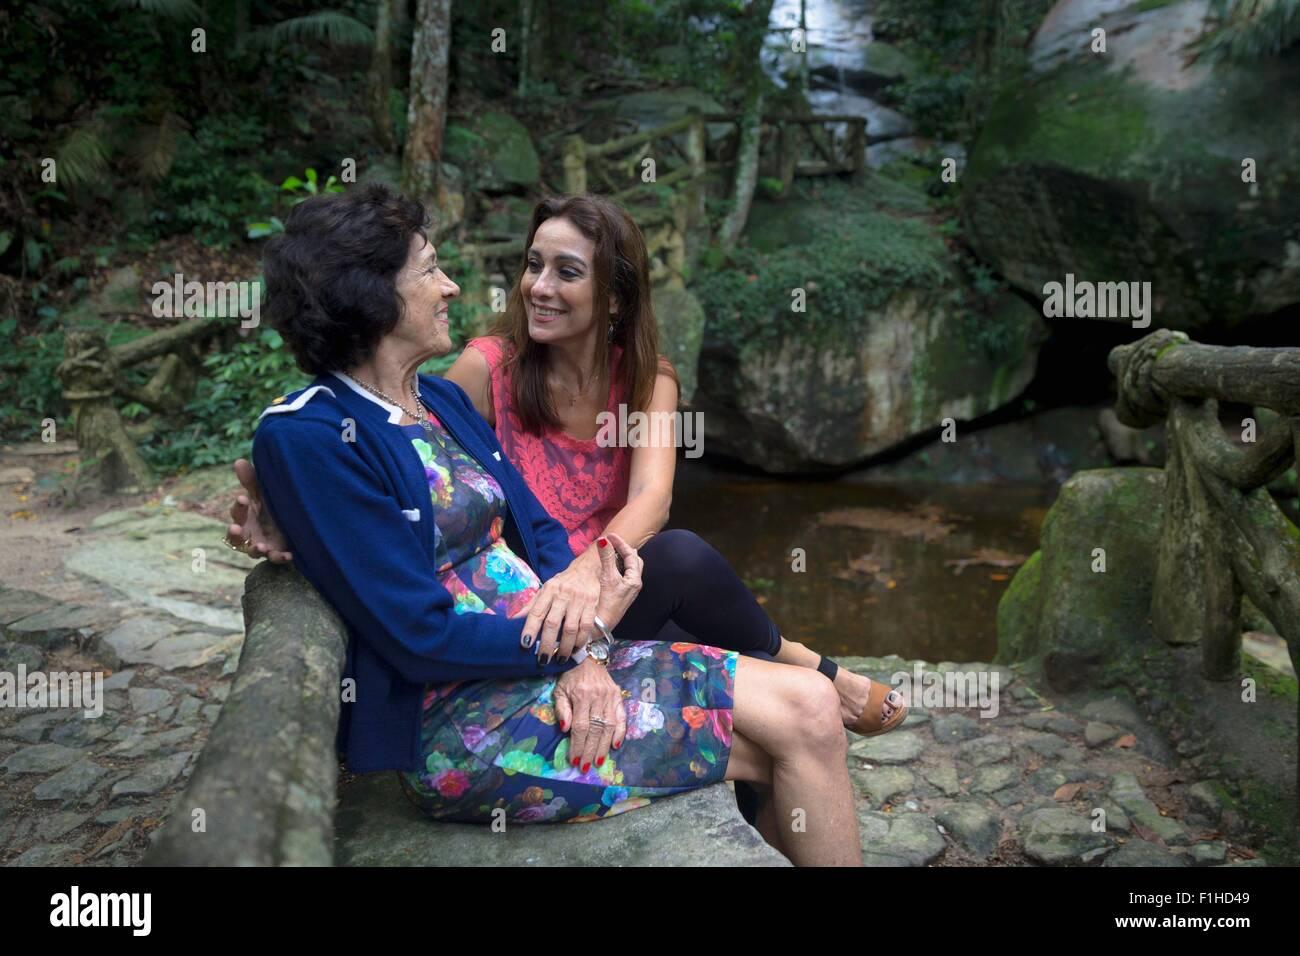 Ältere Frau und Tochter Hand in Hand am Wald river Stockbild